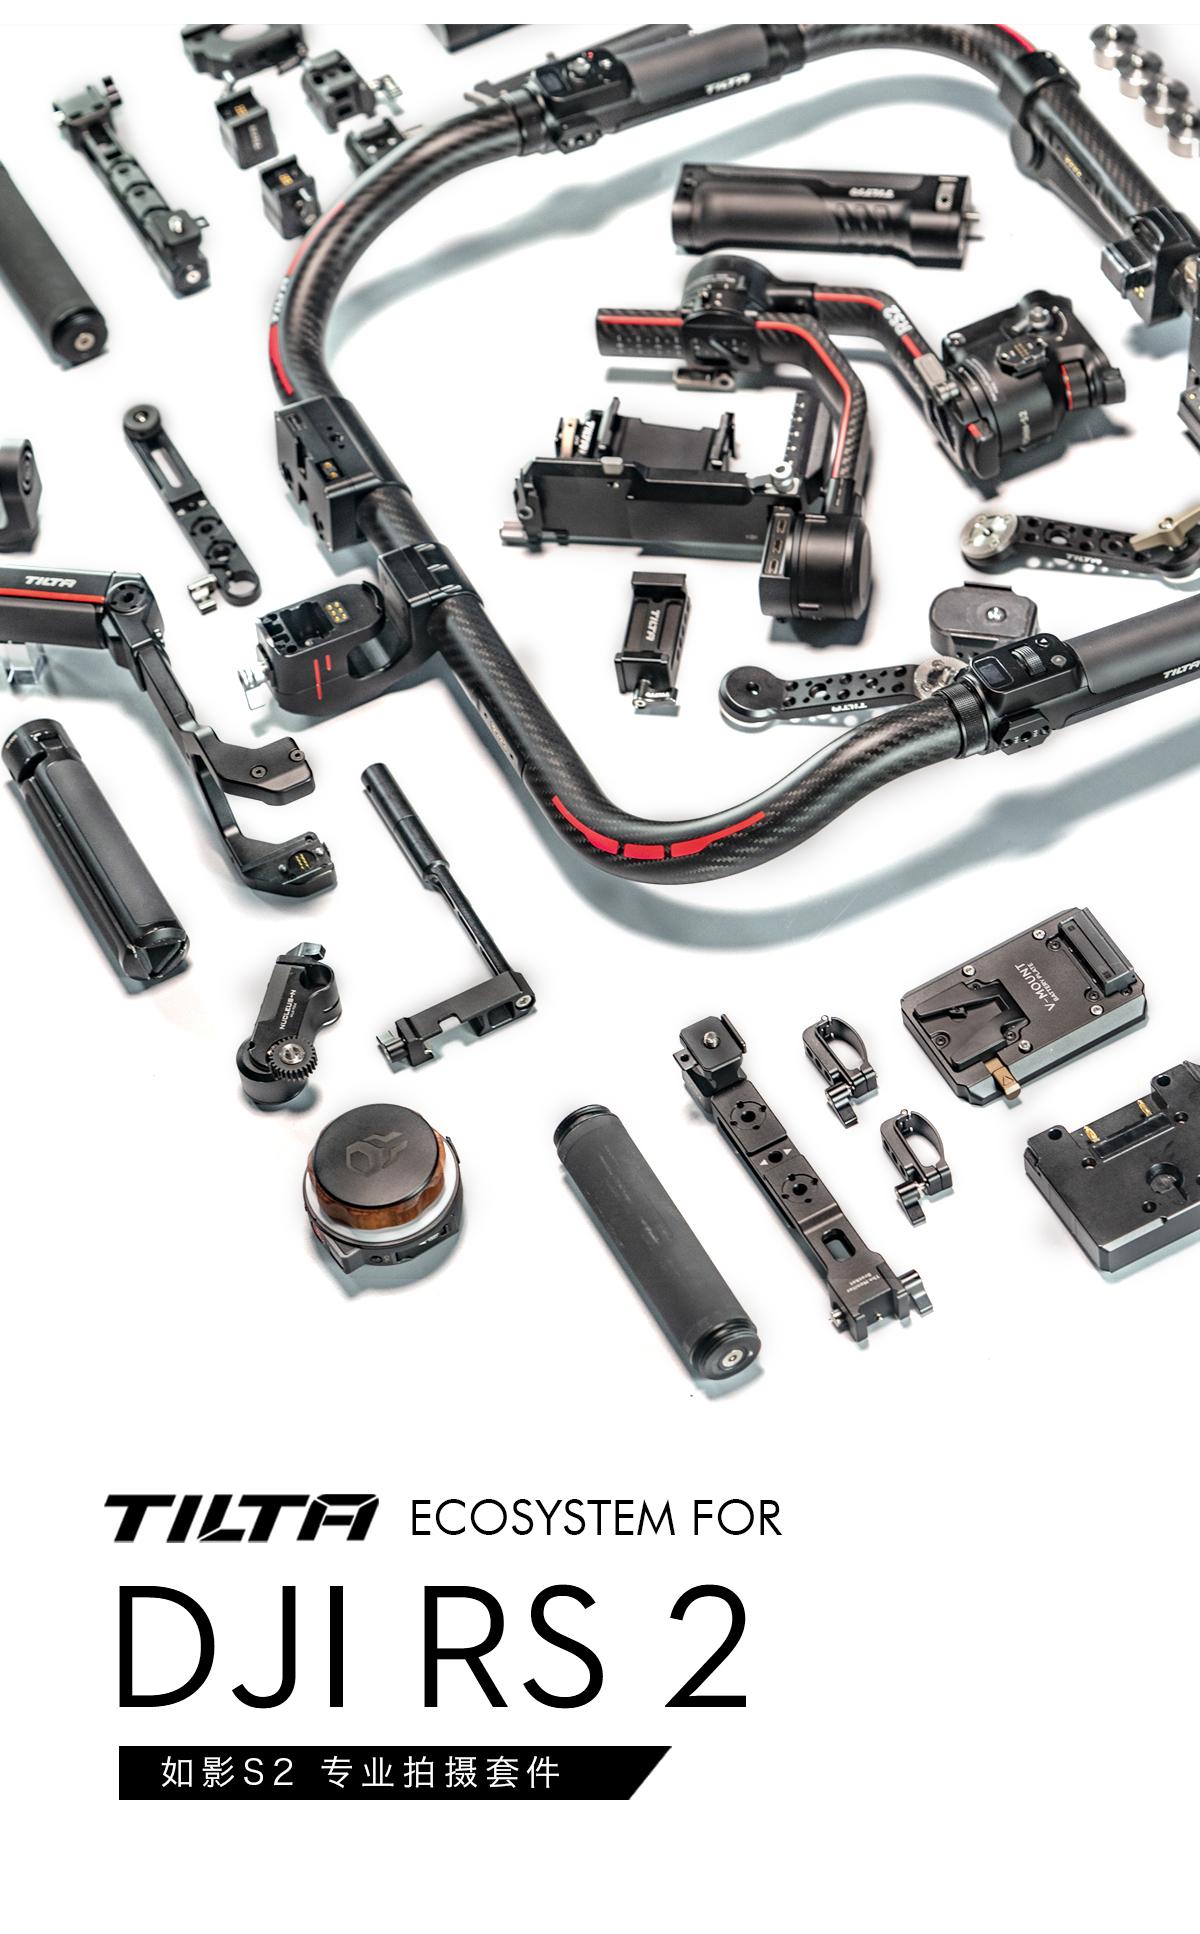 Tilta Ecosystem for DJI RS 2